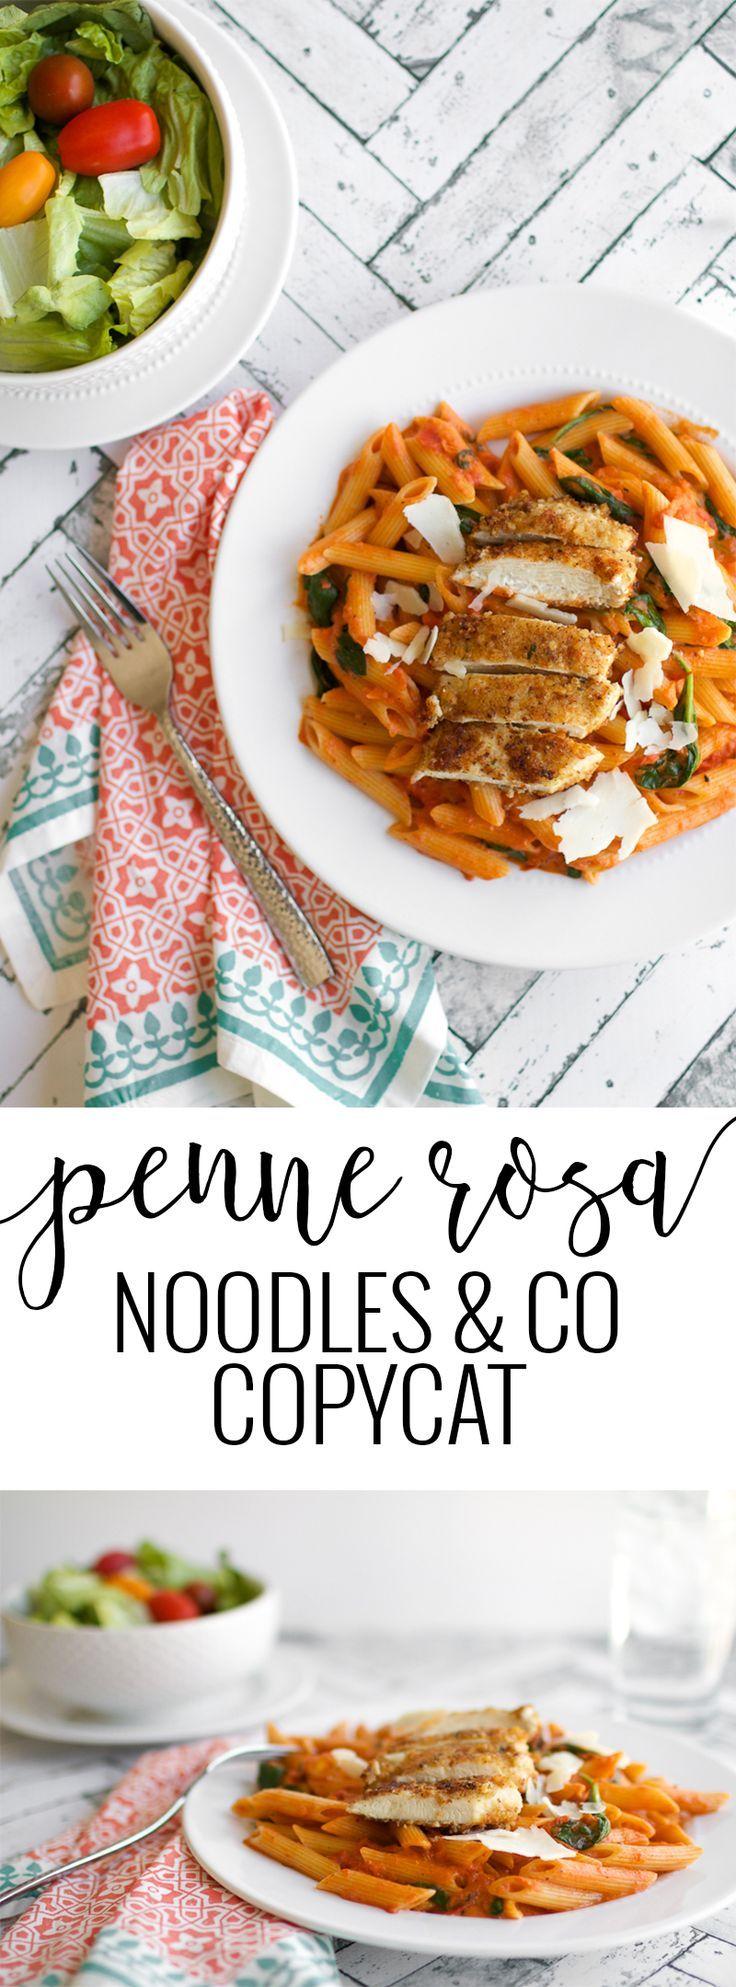 Penne Rosa Recipe | Noodles & Company Copycat Recipe | homemade penne rosa | homemade pasta recipes | homemade italian recipes | copycat recipe ideas | penne rosa homemade | italian dinner recipes | easy dinner recipes | easy italian recipes | easy pasta